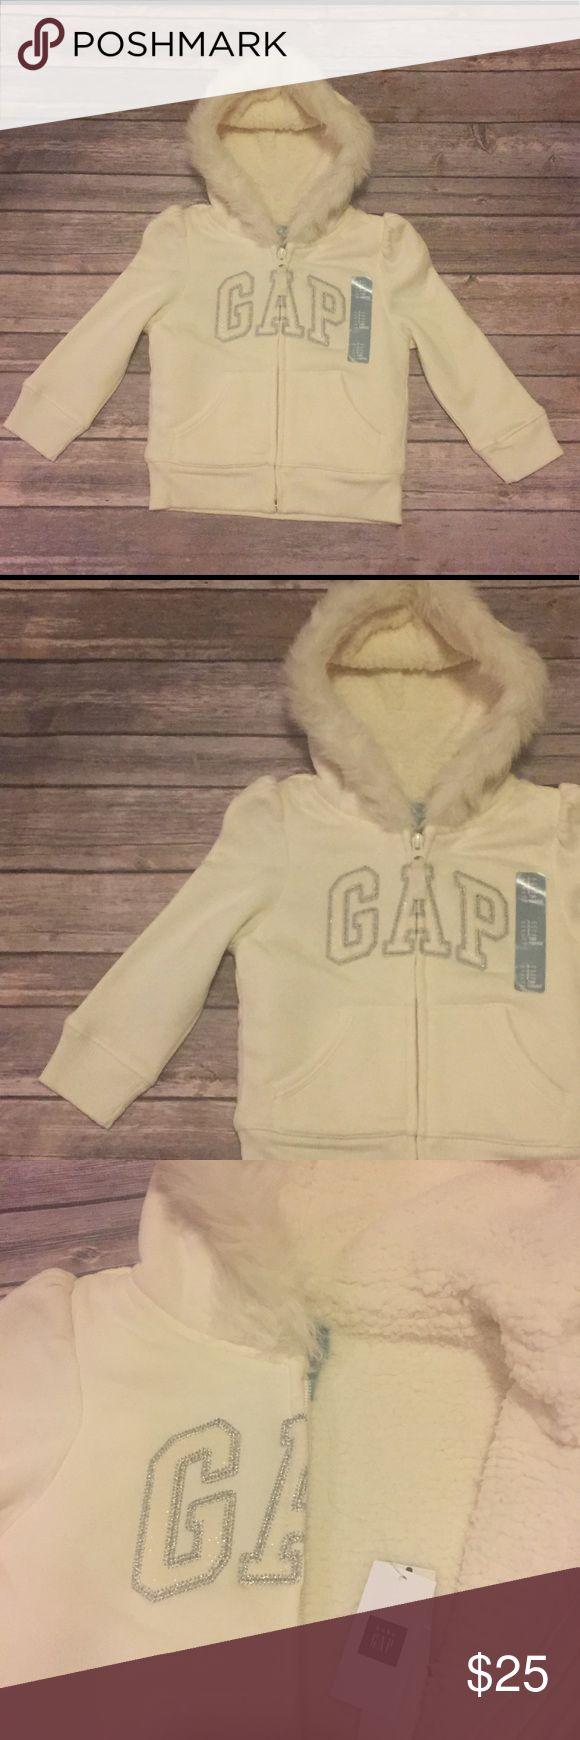 NWT Baby Gap Hoodie, 3T NWT Baby Gap Outlet Hoodie, 3T, adorable white, hooded, Sherpa lined sweatshirt, zips closes.  Faux fur around hood, gathers at top of sleeves.  😍😍😍 GAP Shirts & Tops Sweatshirts & Hoodies